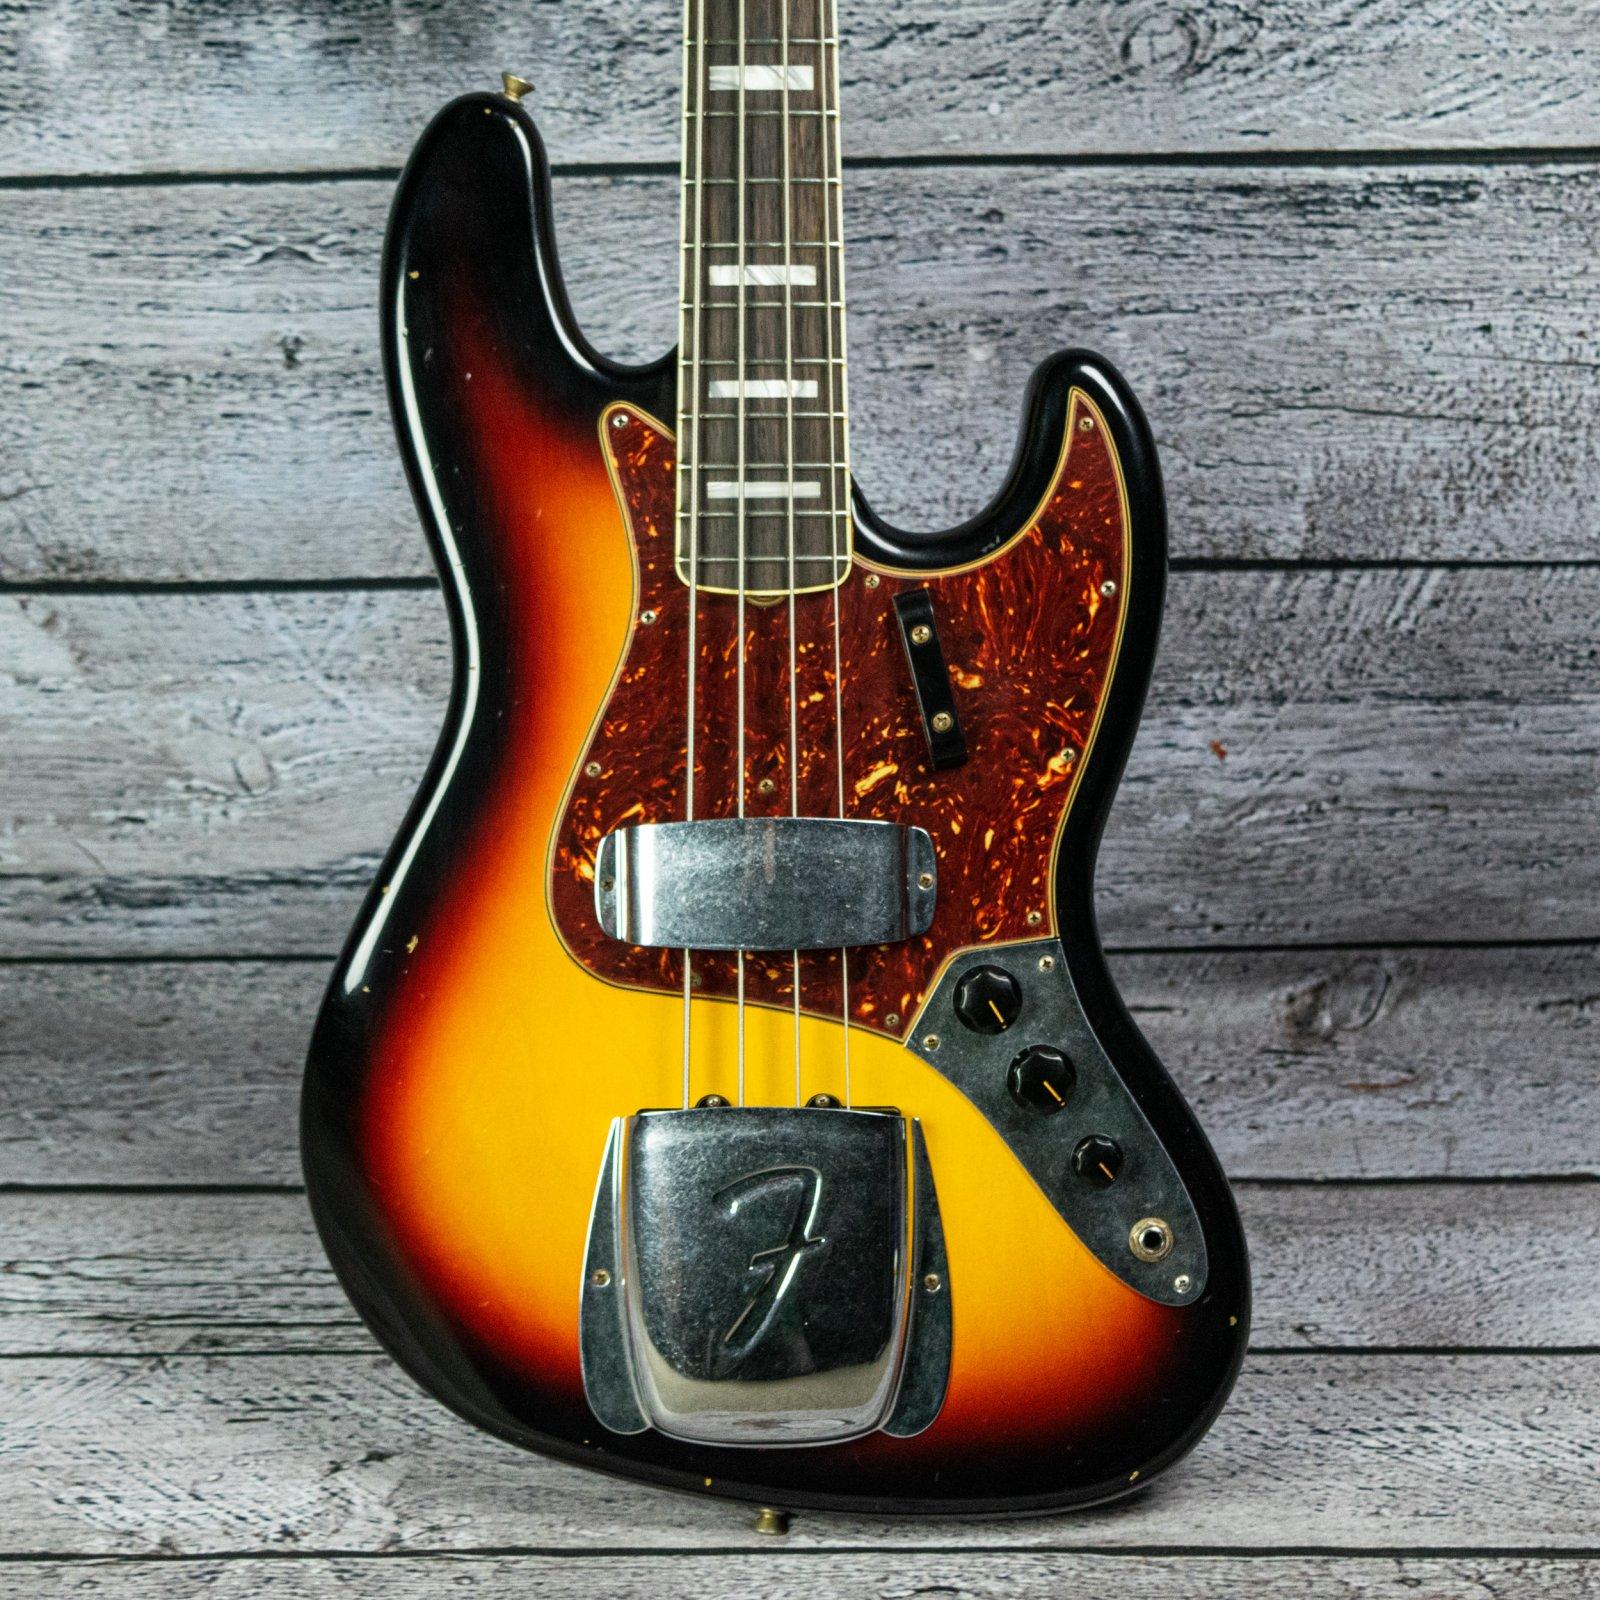 Fender Custom Shop 1966 Jazz Bass Journeyman Relic - Rosewood Fingerboard, 3-Color Sunburst